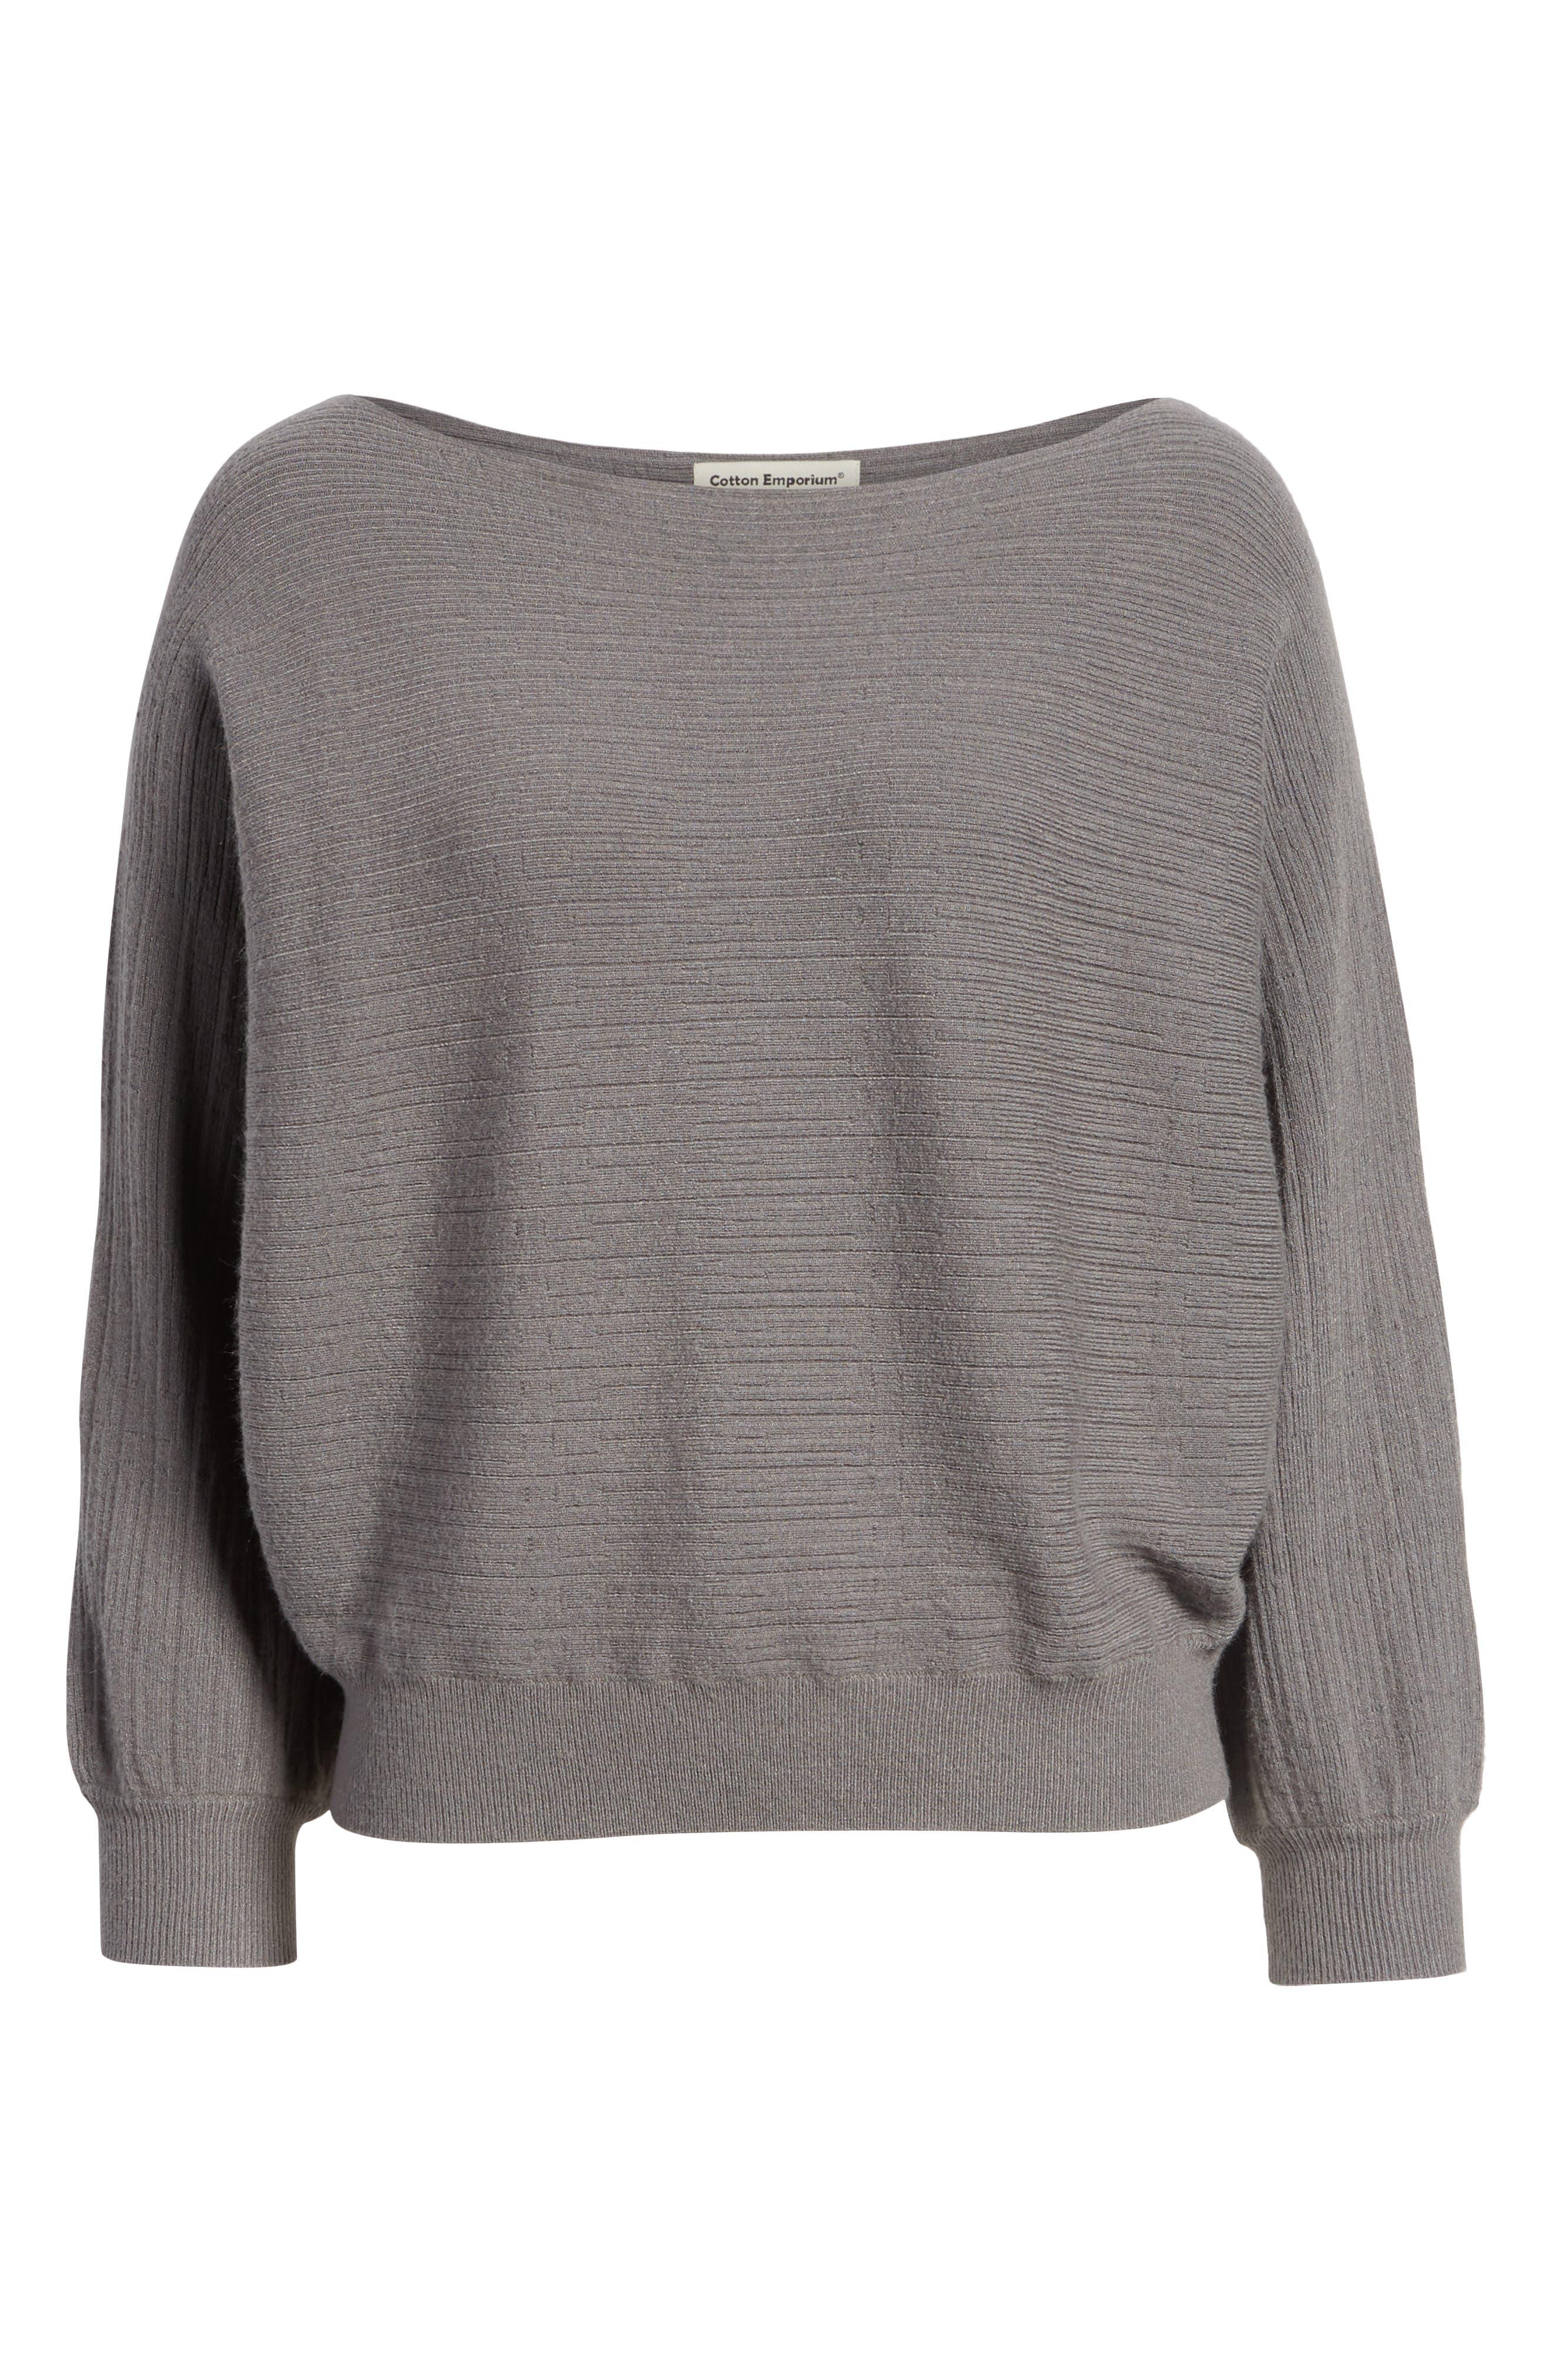 Dolman Boat Neck Sweater,                             Alternate thumbnail 6, color,                             STEEL GRAY